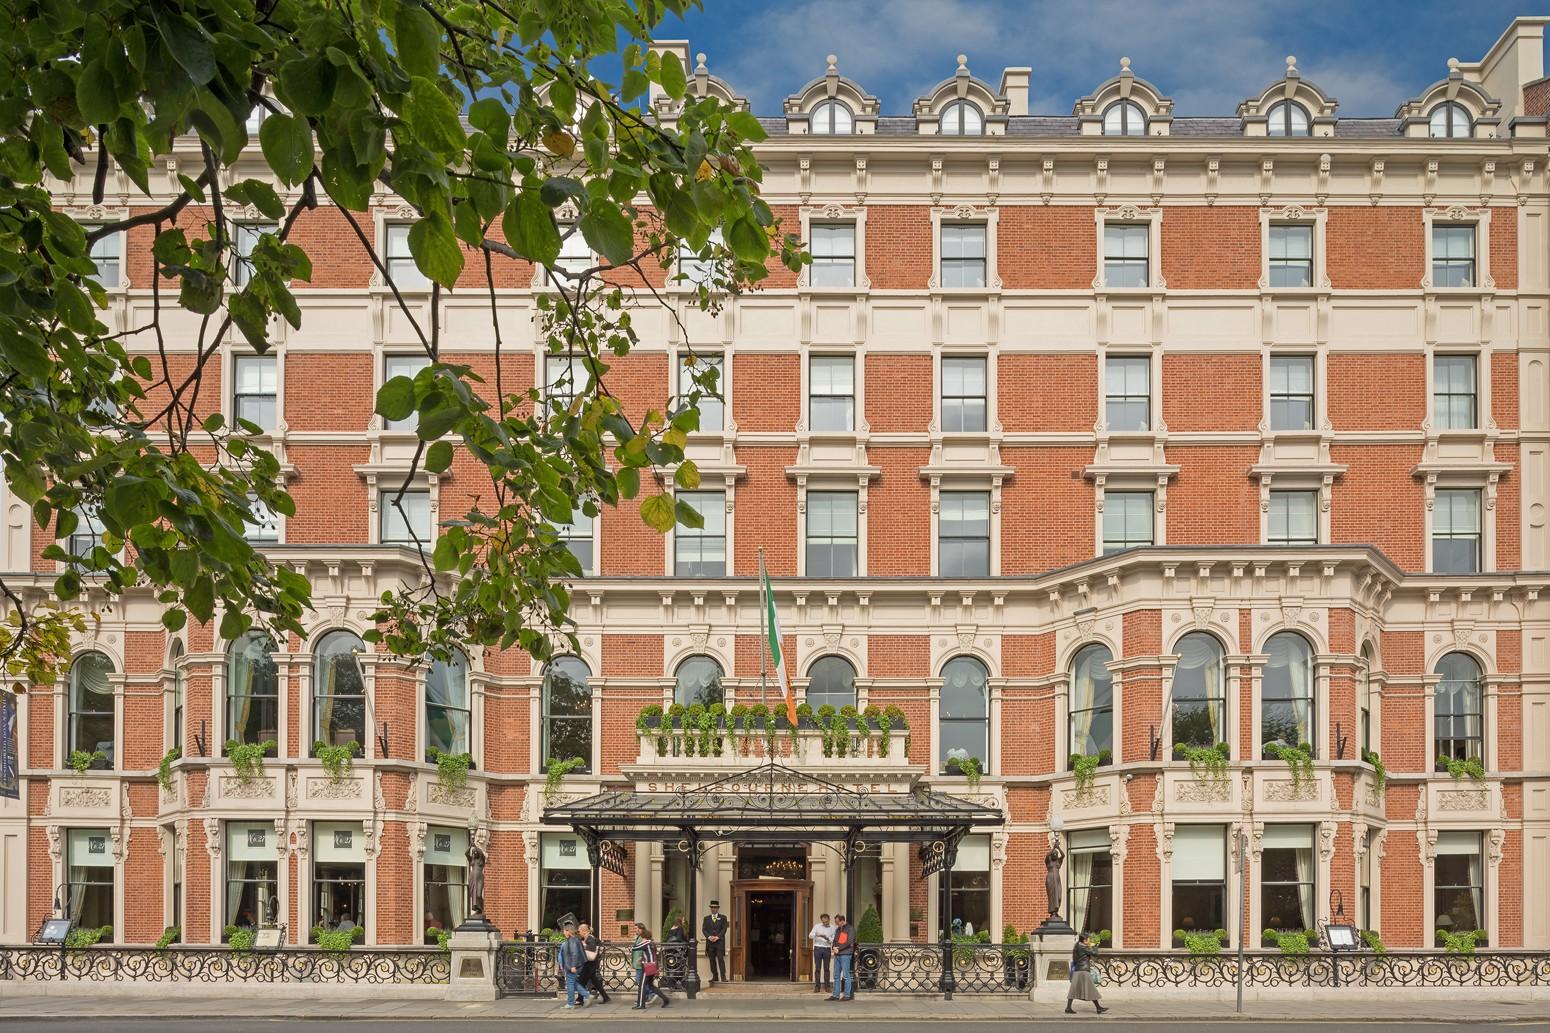 Dublin's Iconic Shelbourne Hotel by Kelvin Gillmor